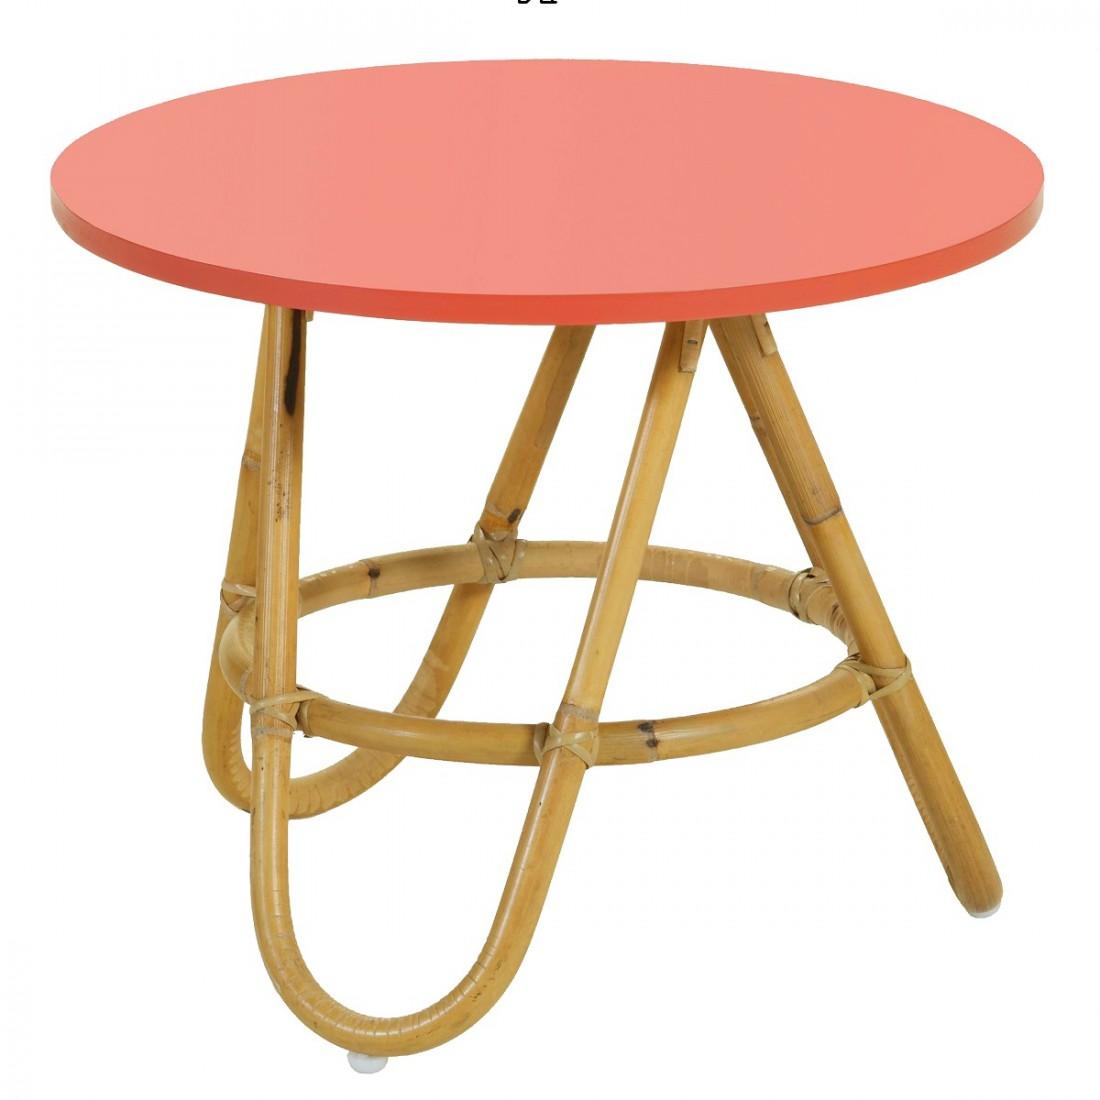 table basse diabolo gm en rotin naturel et plateau rotin naturel. Black Bedroom Furniture Sets. Home Design Ideas